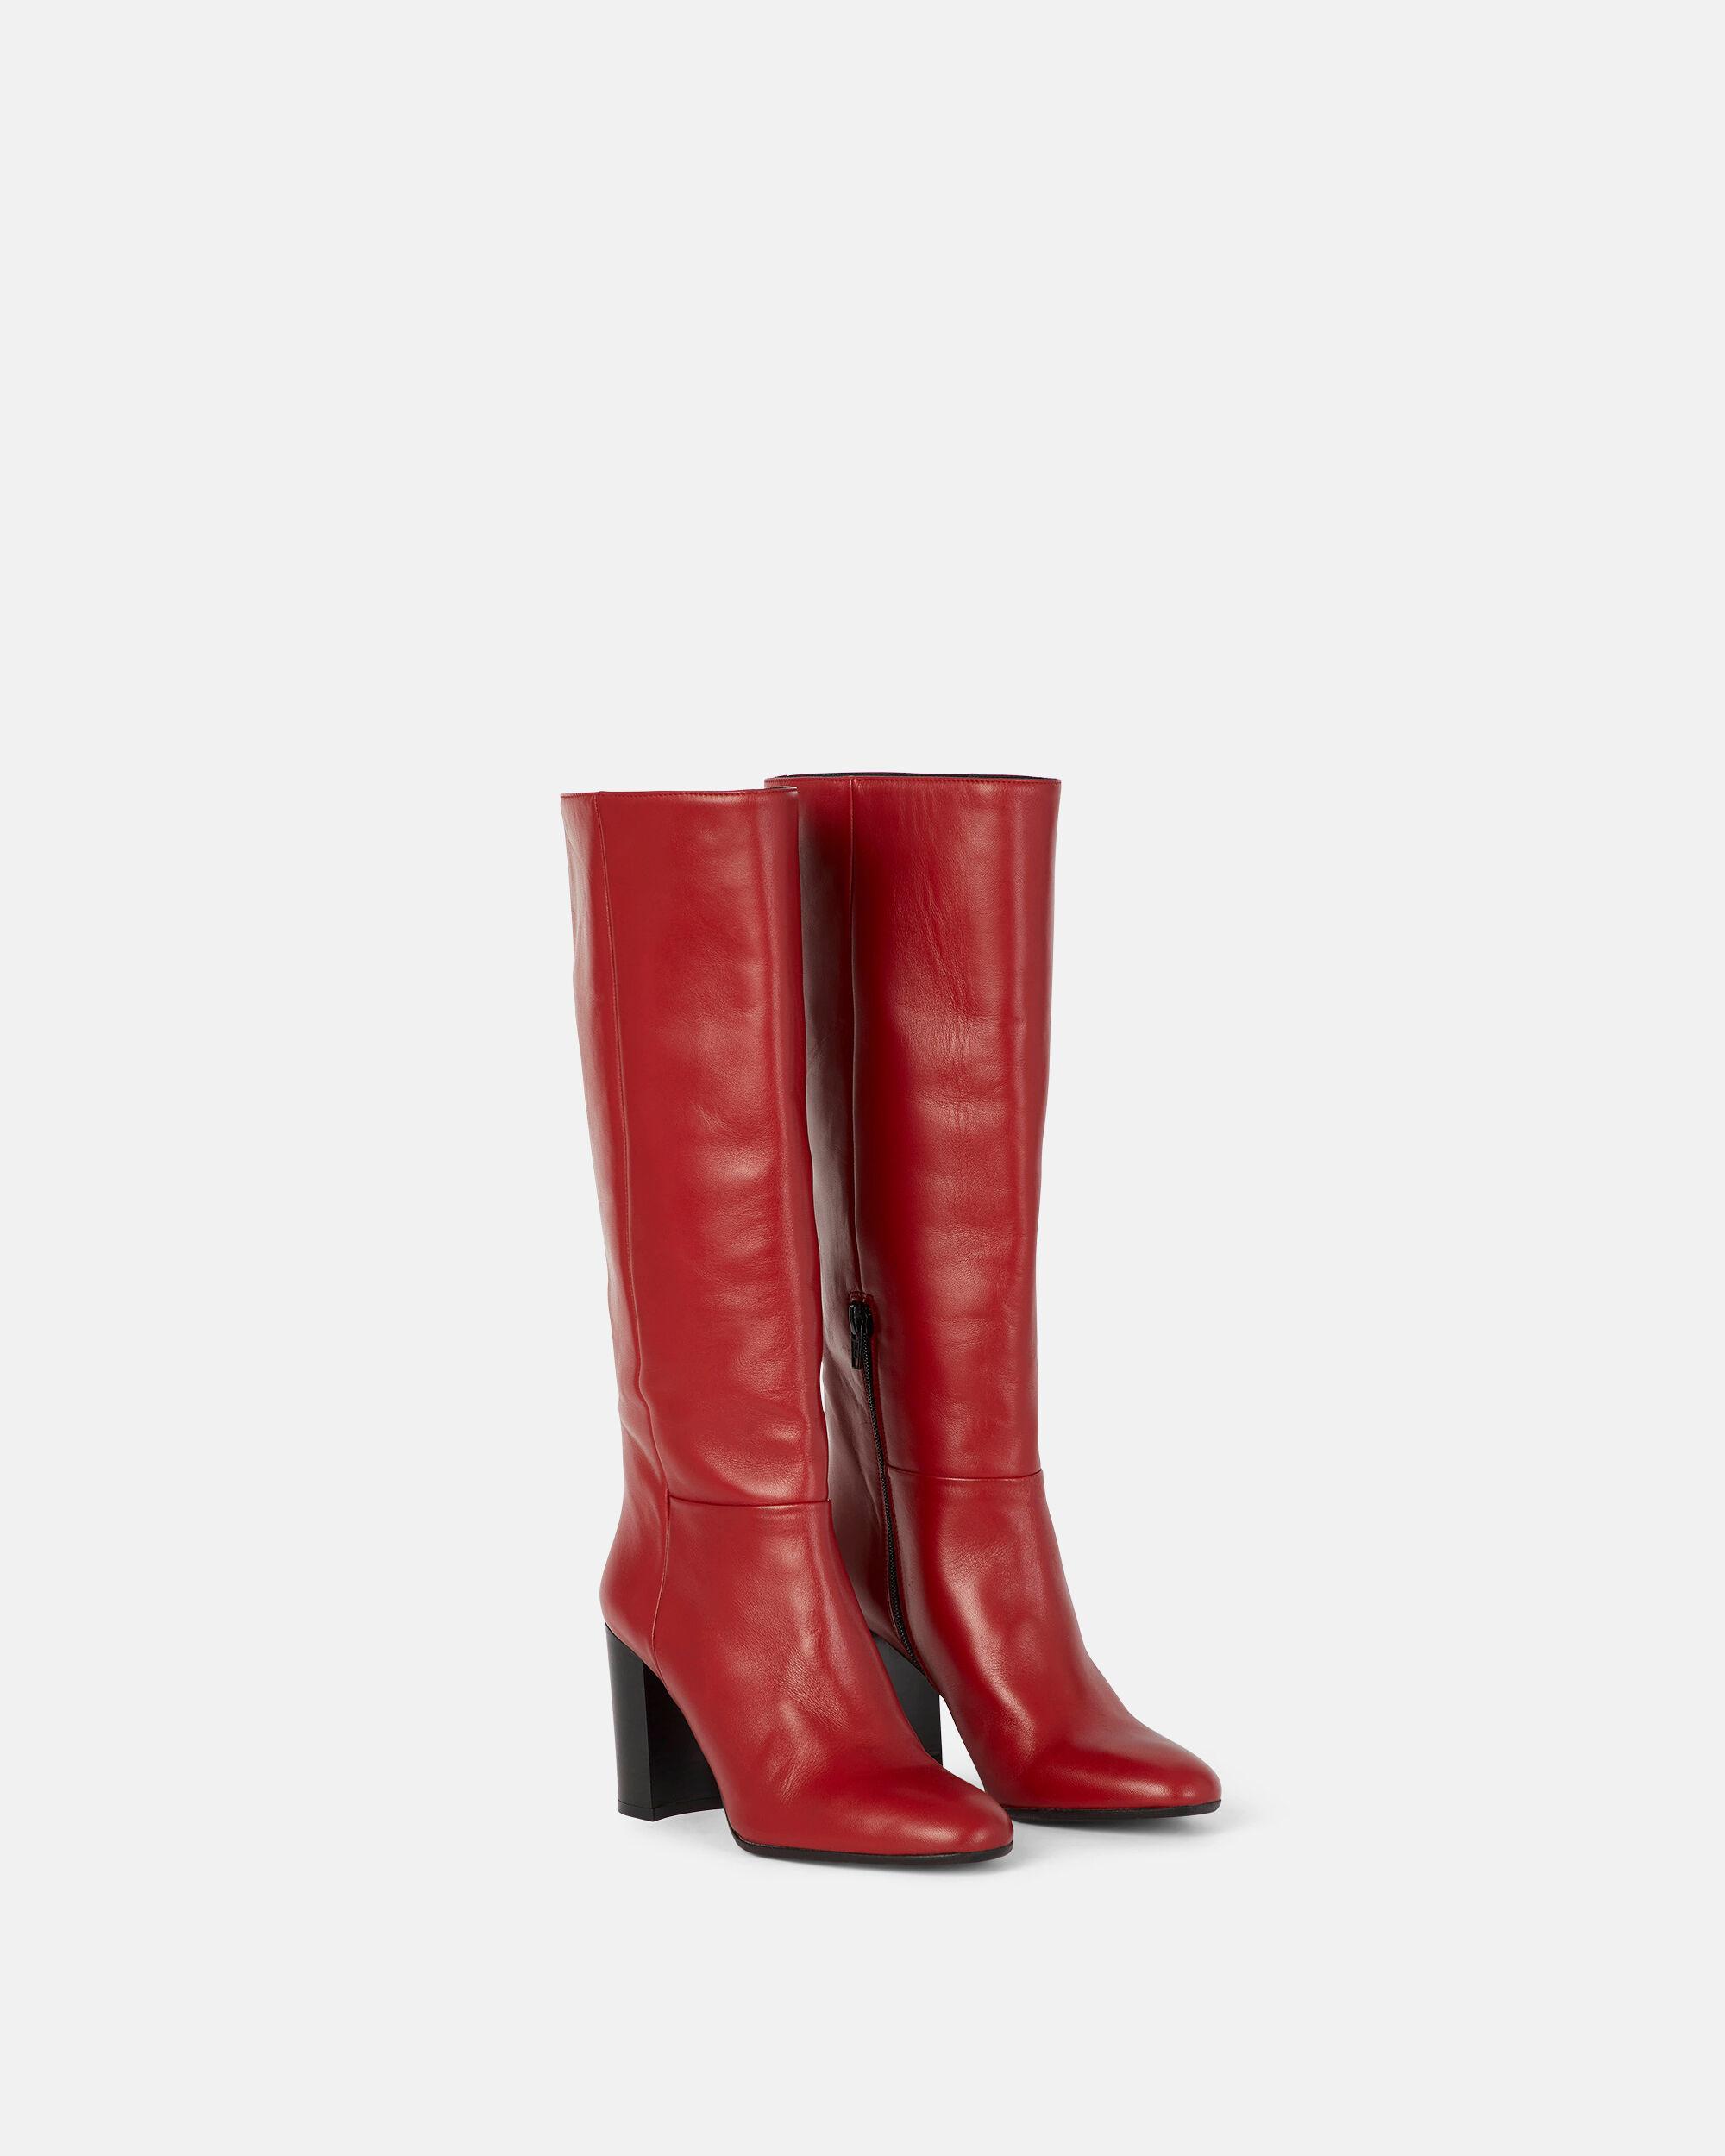 bottes cuir rouge homme